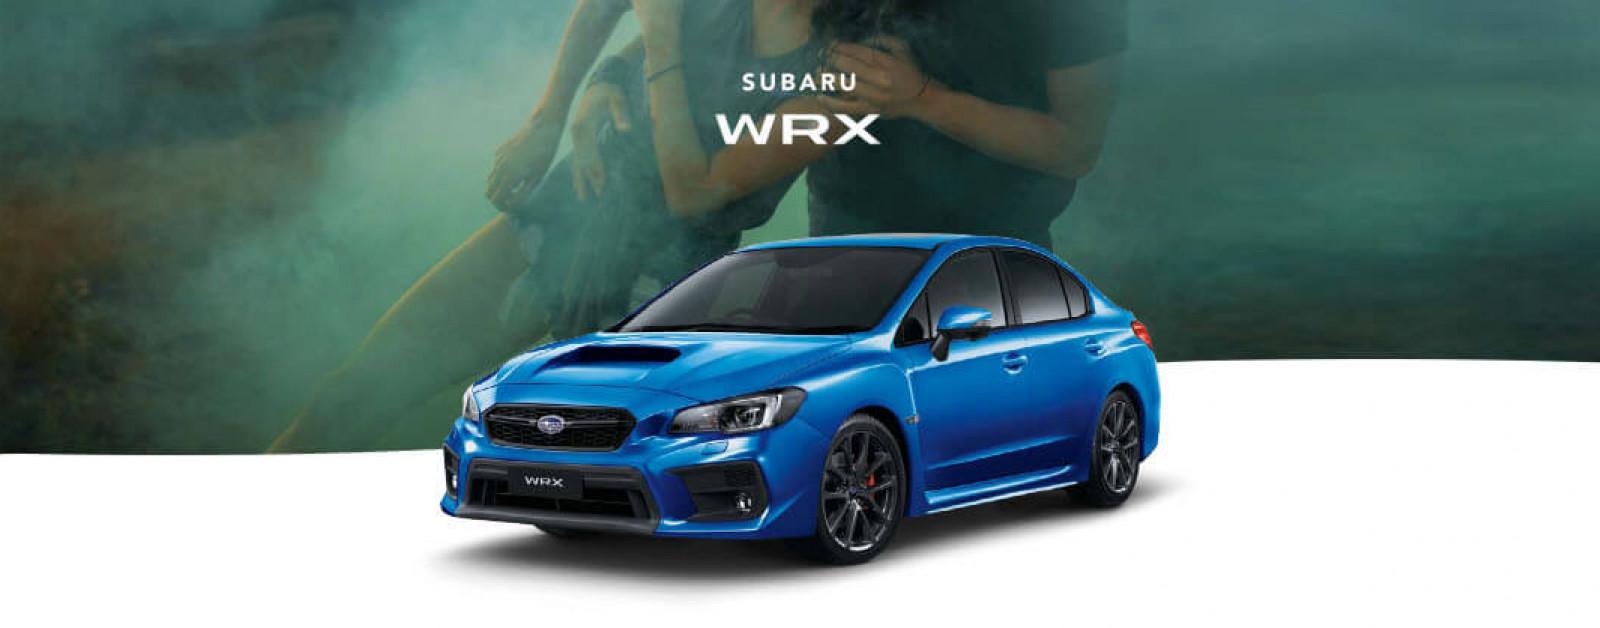 New Subaru WRX for sale in Brisbane - Cricks Highway Subaru